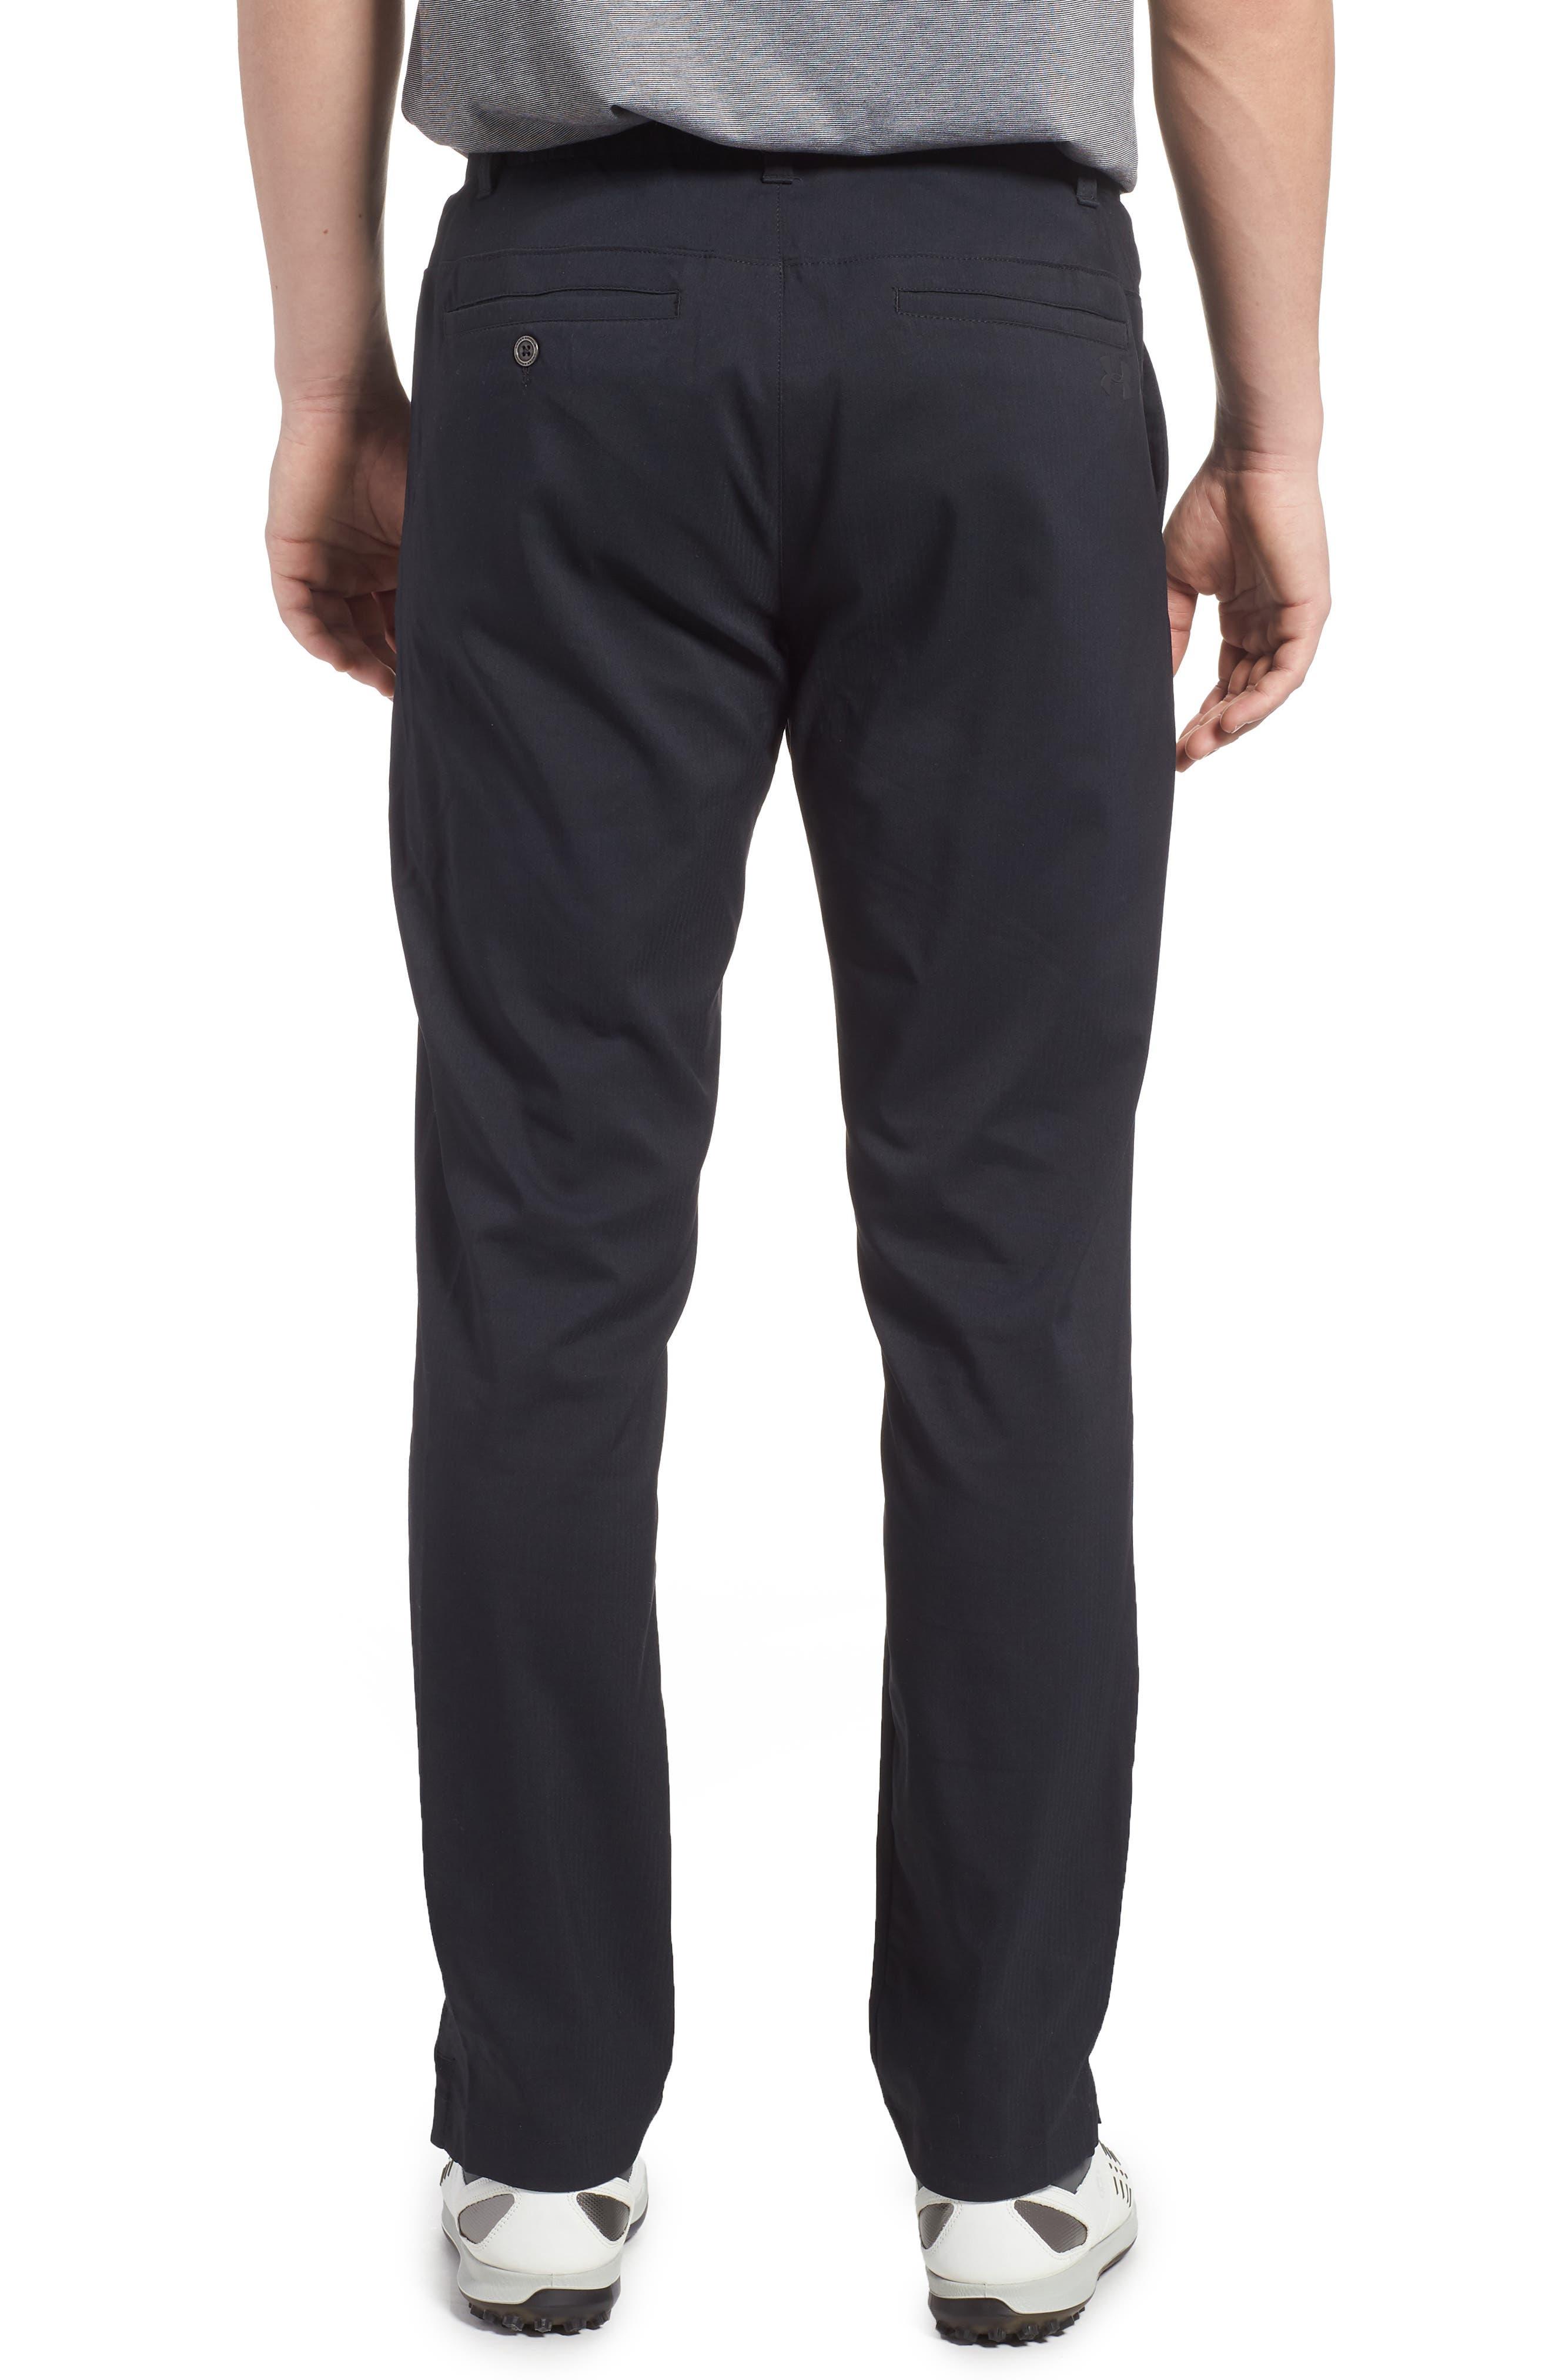 Showdown Pants,                             Alternate thumbnail 2, color,                             BLACK